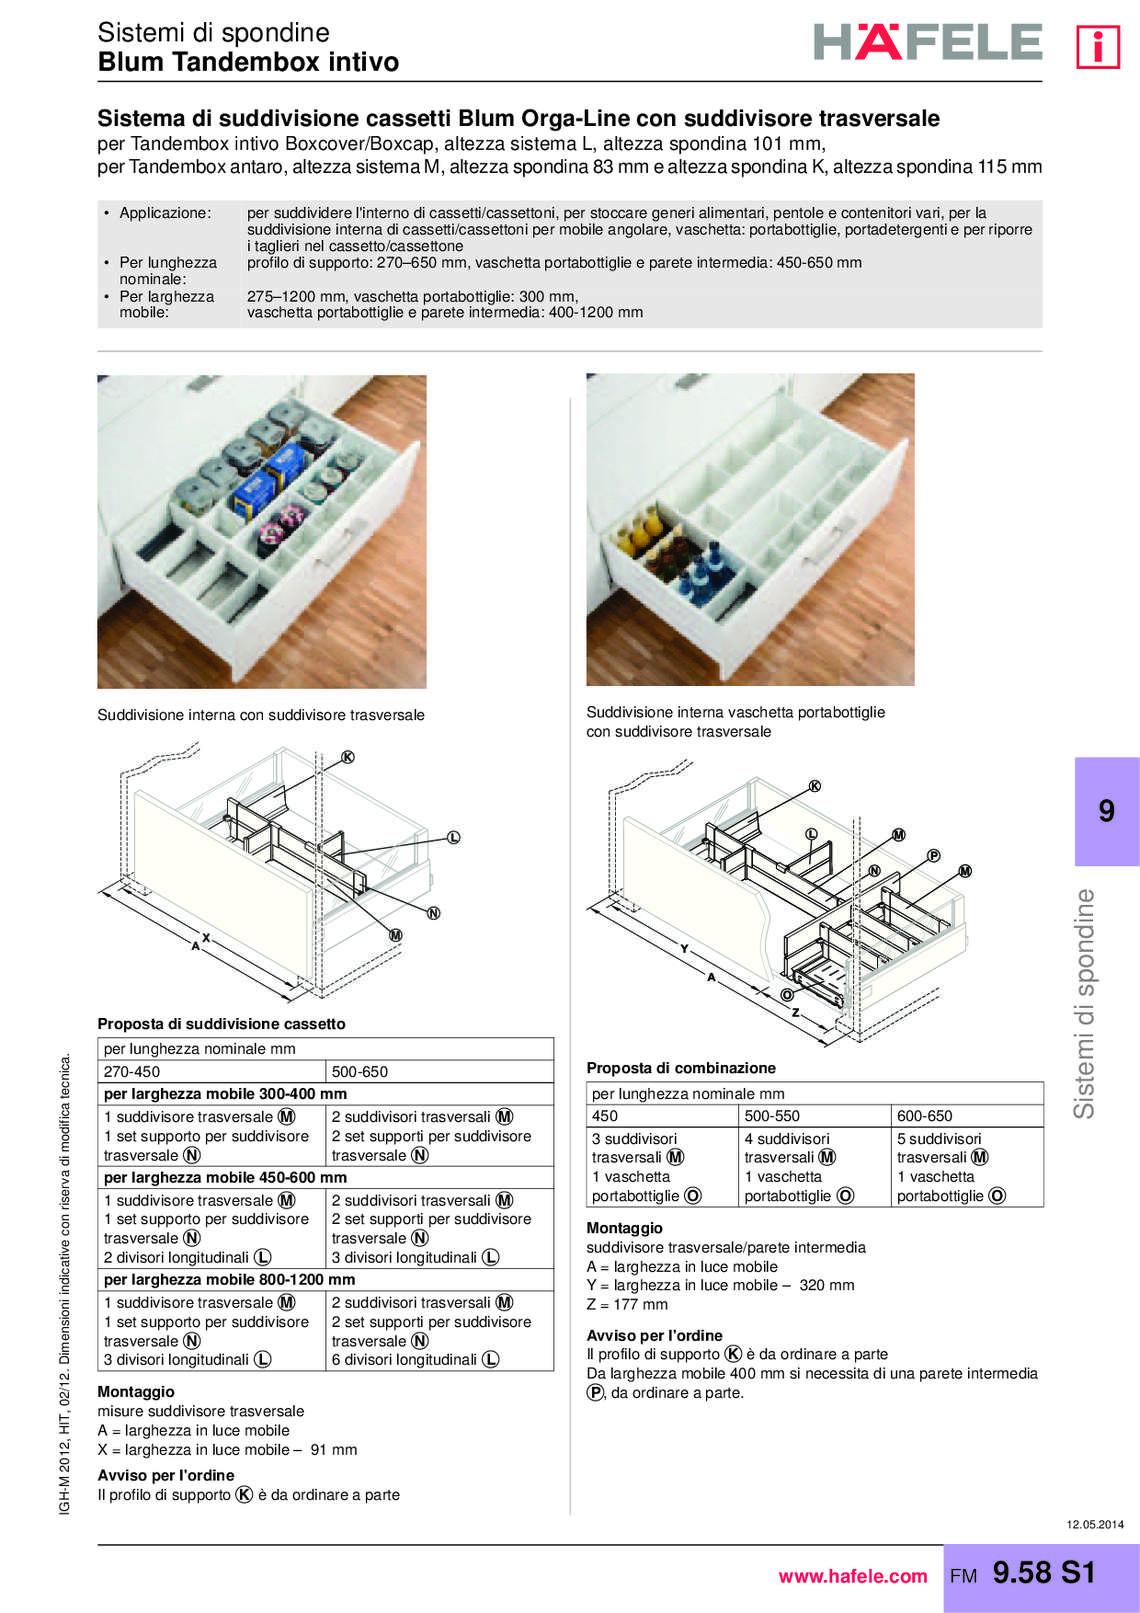 hafele-spondine-e-guide-per-mobili_40_094.jpg